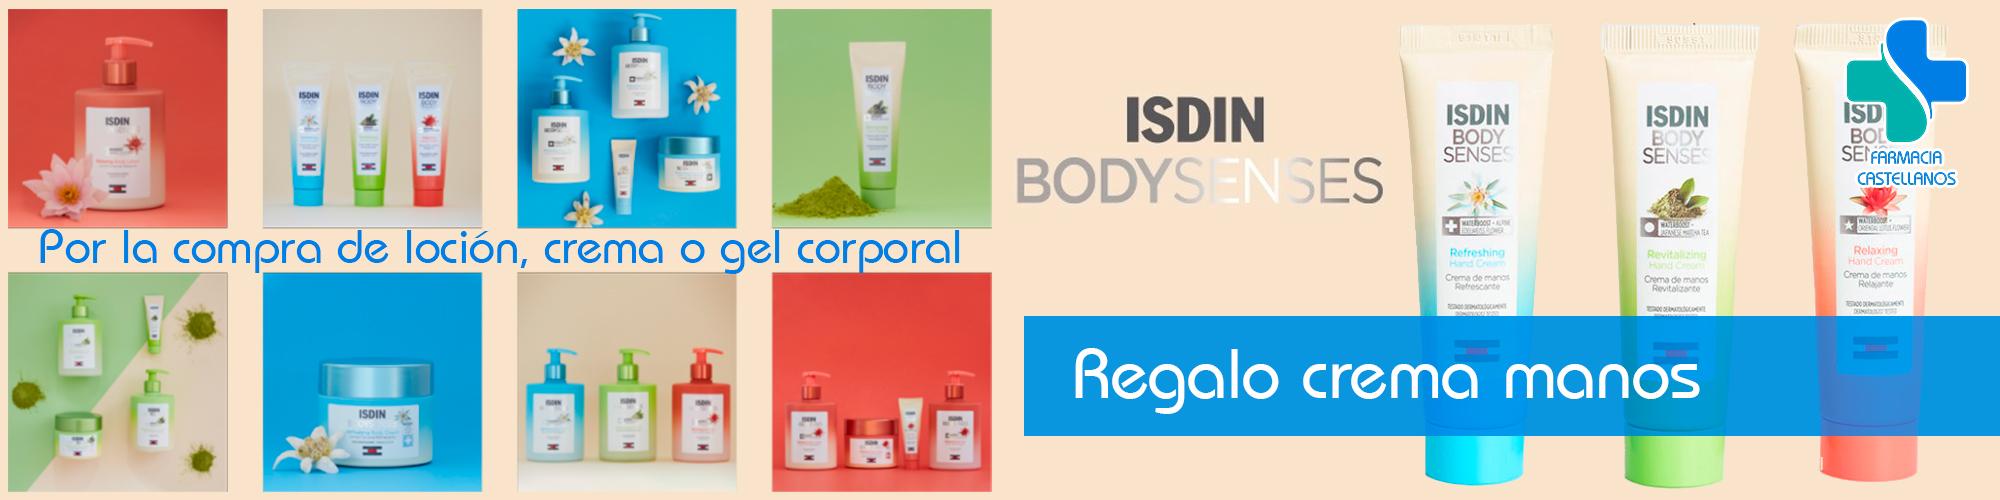 promo-isdin-bodysenses-farmaciabeatrizcastellanos